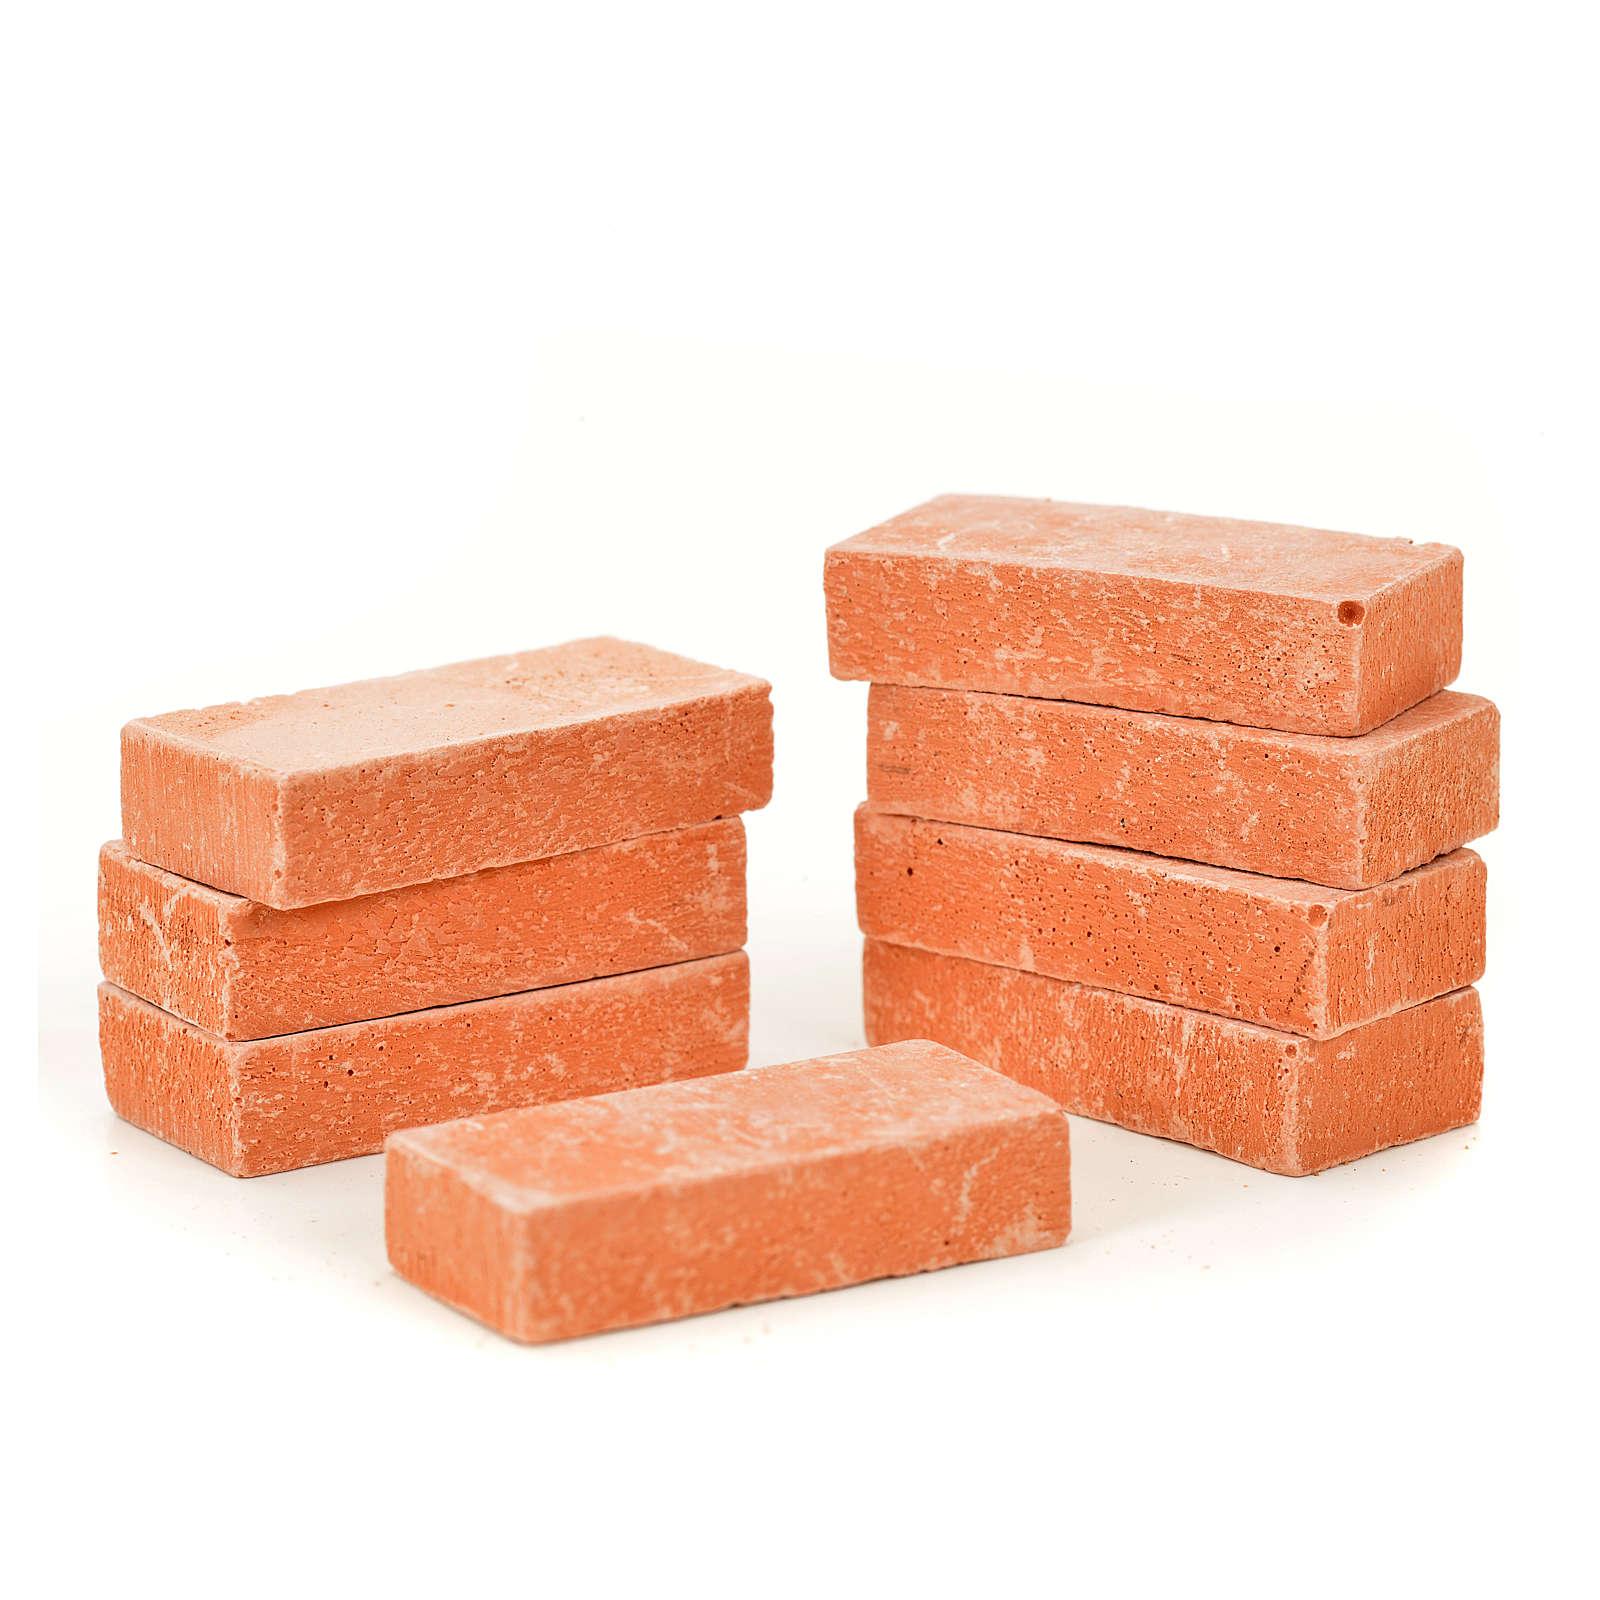 Nativity accessory, resin bricks 20x10mm, 8pcs 4